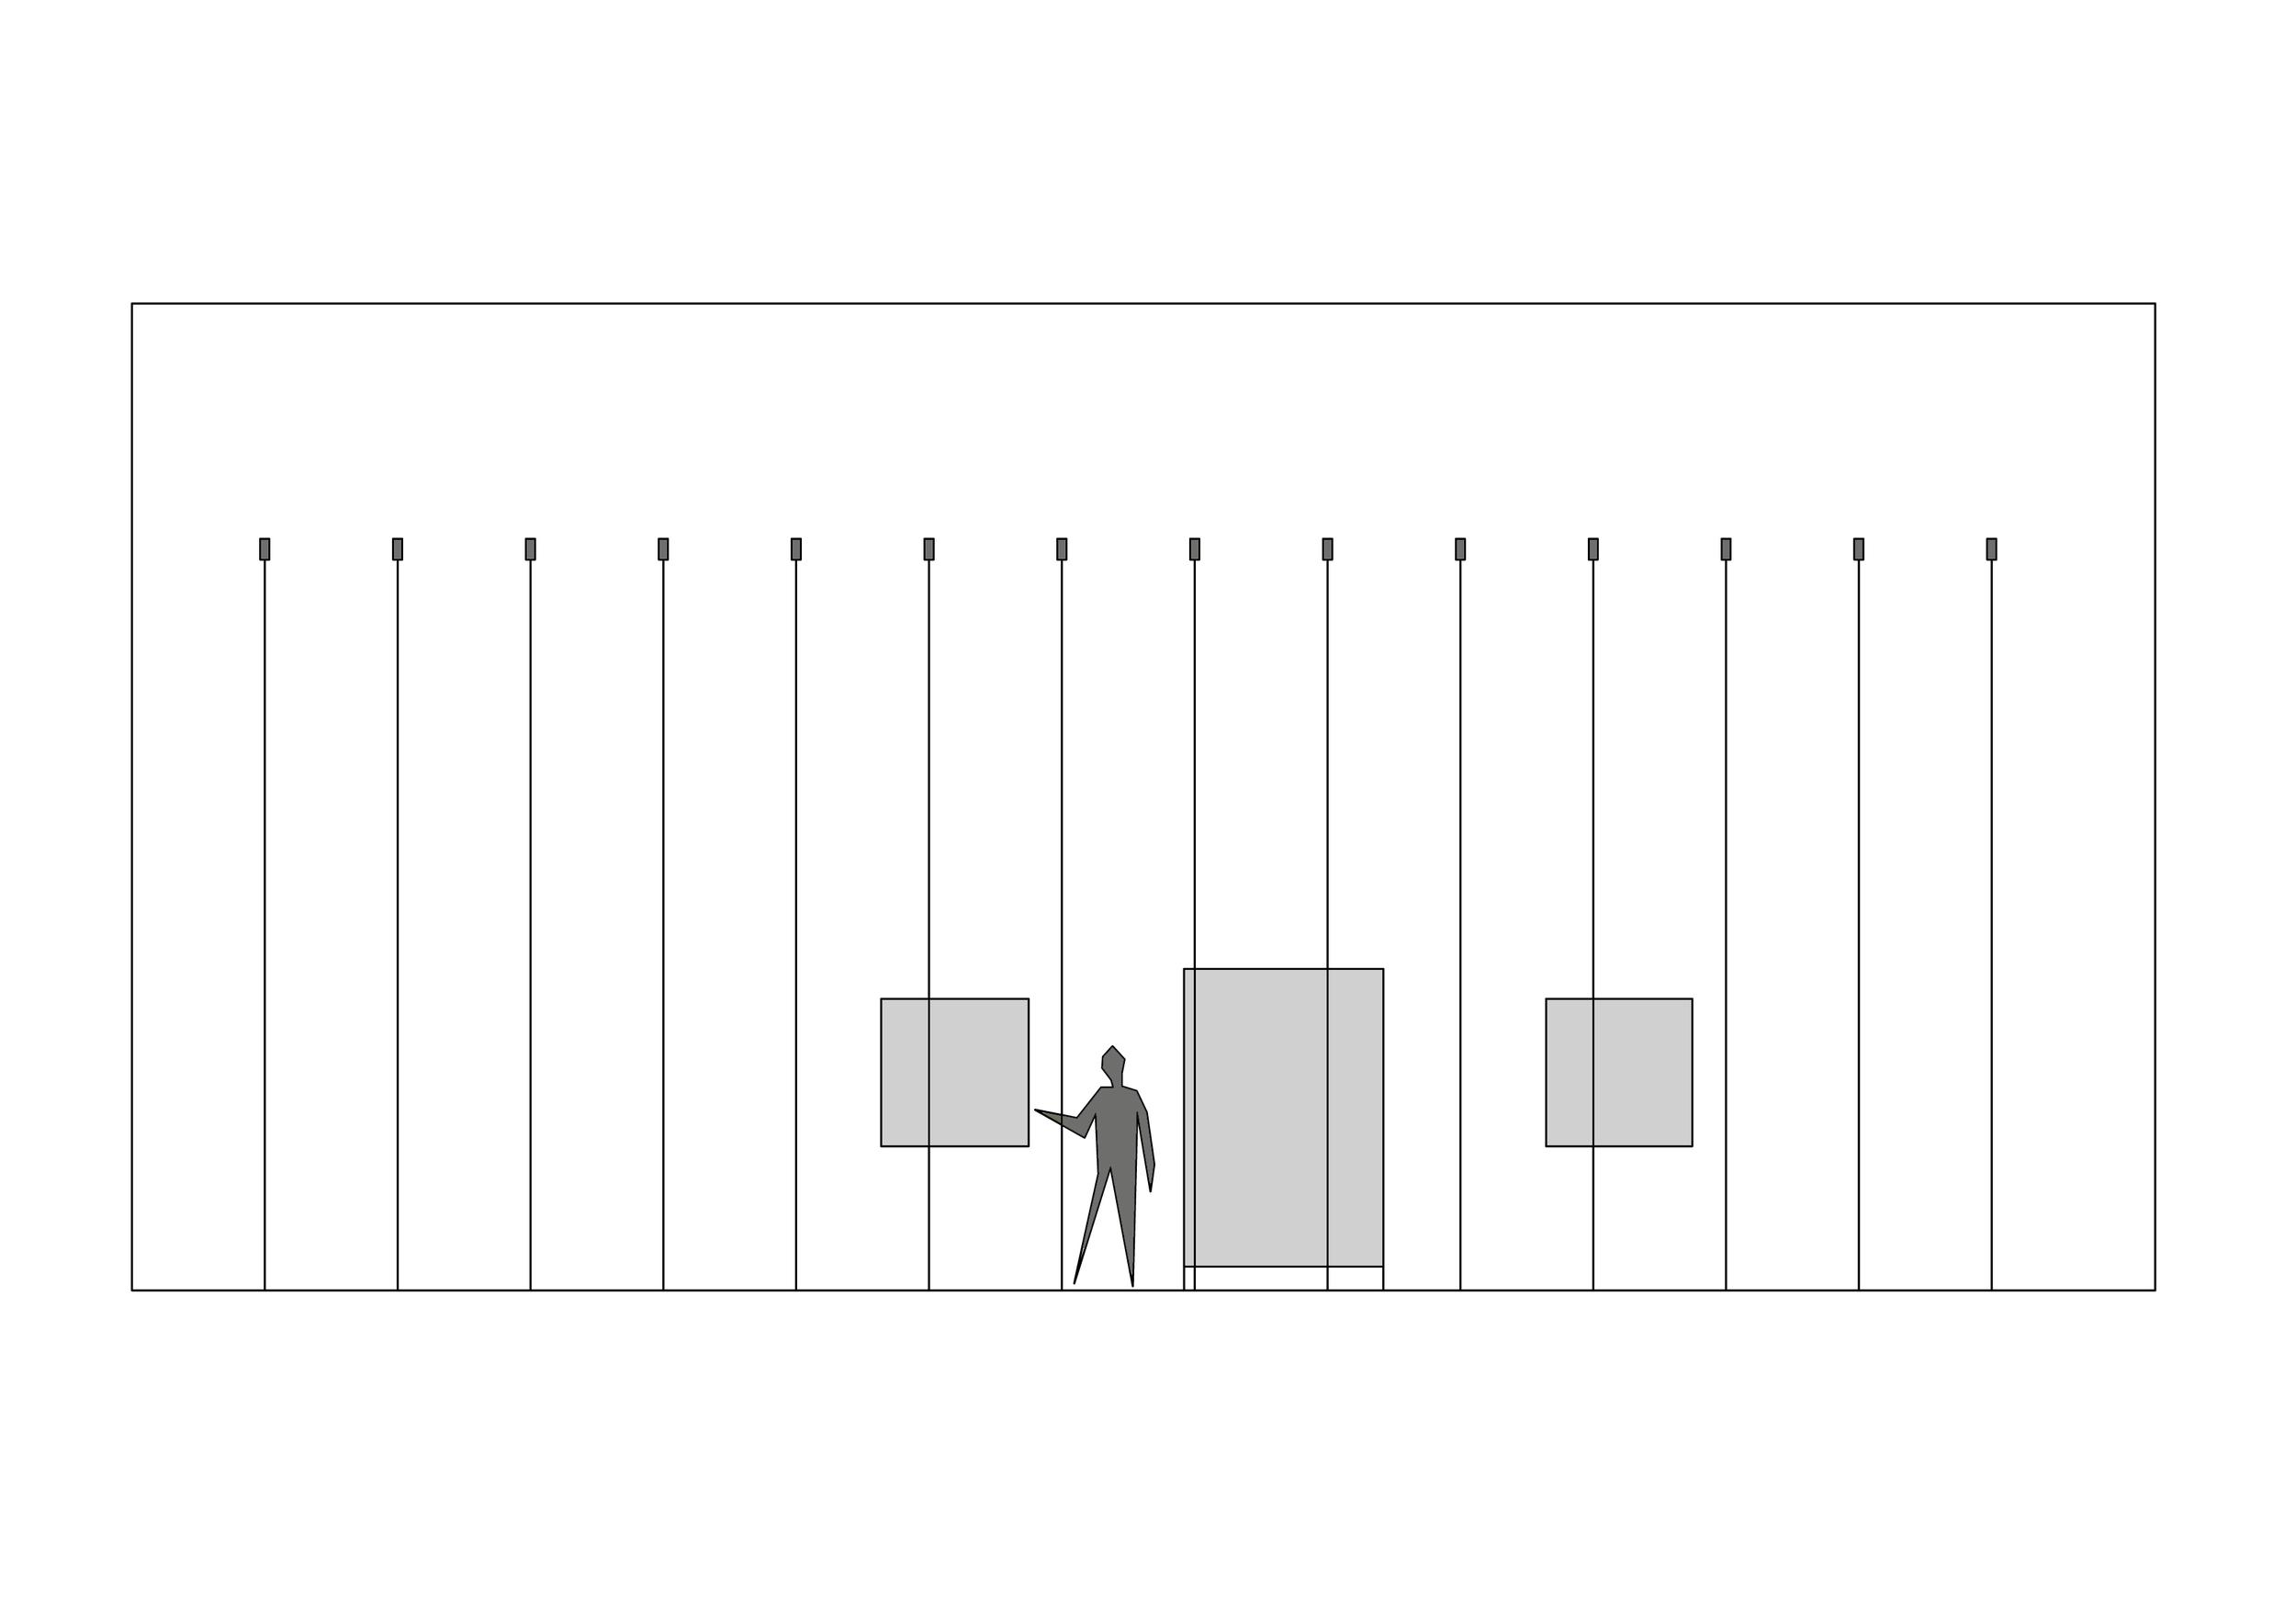 GaleriaVermelho spray layout final Model (3).jpg